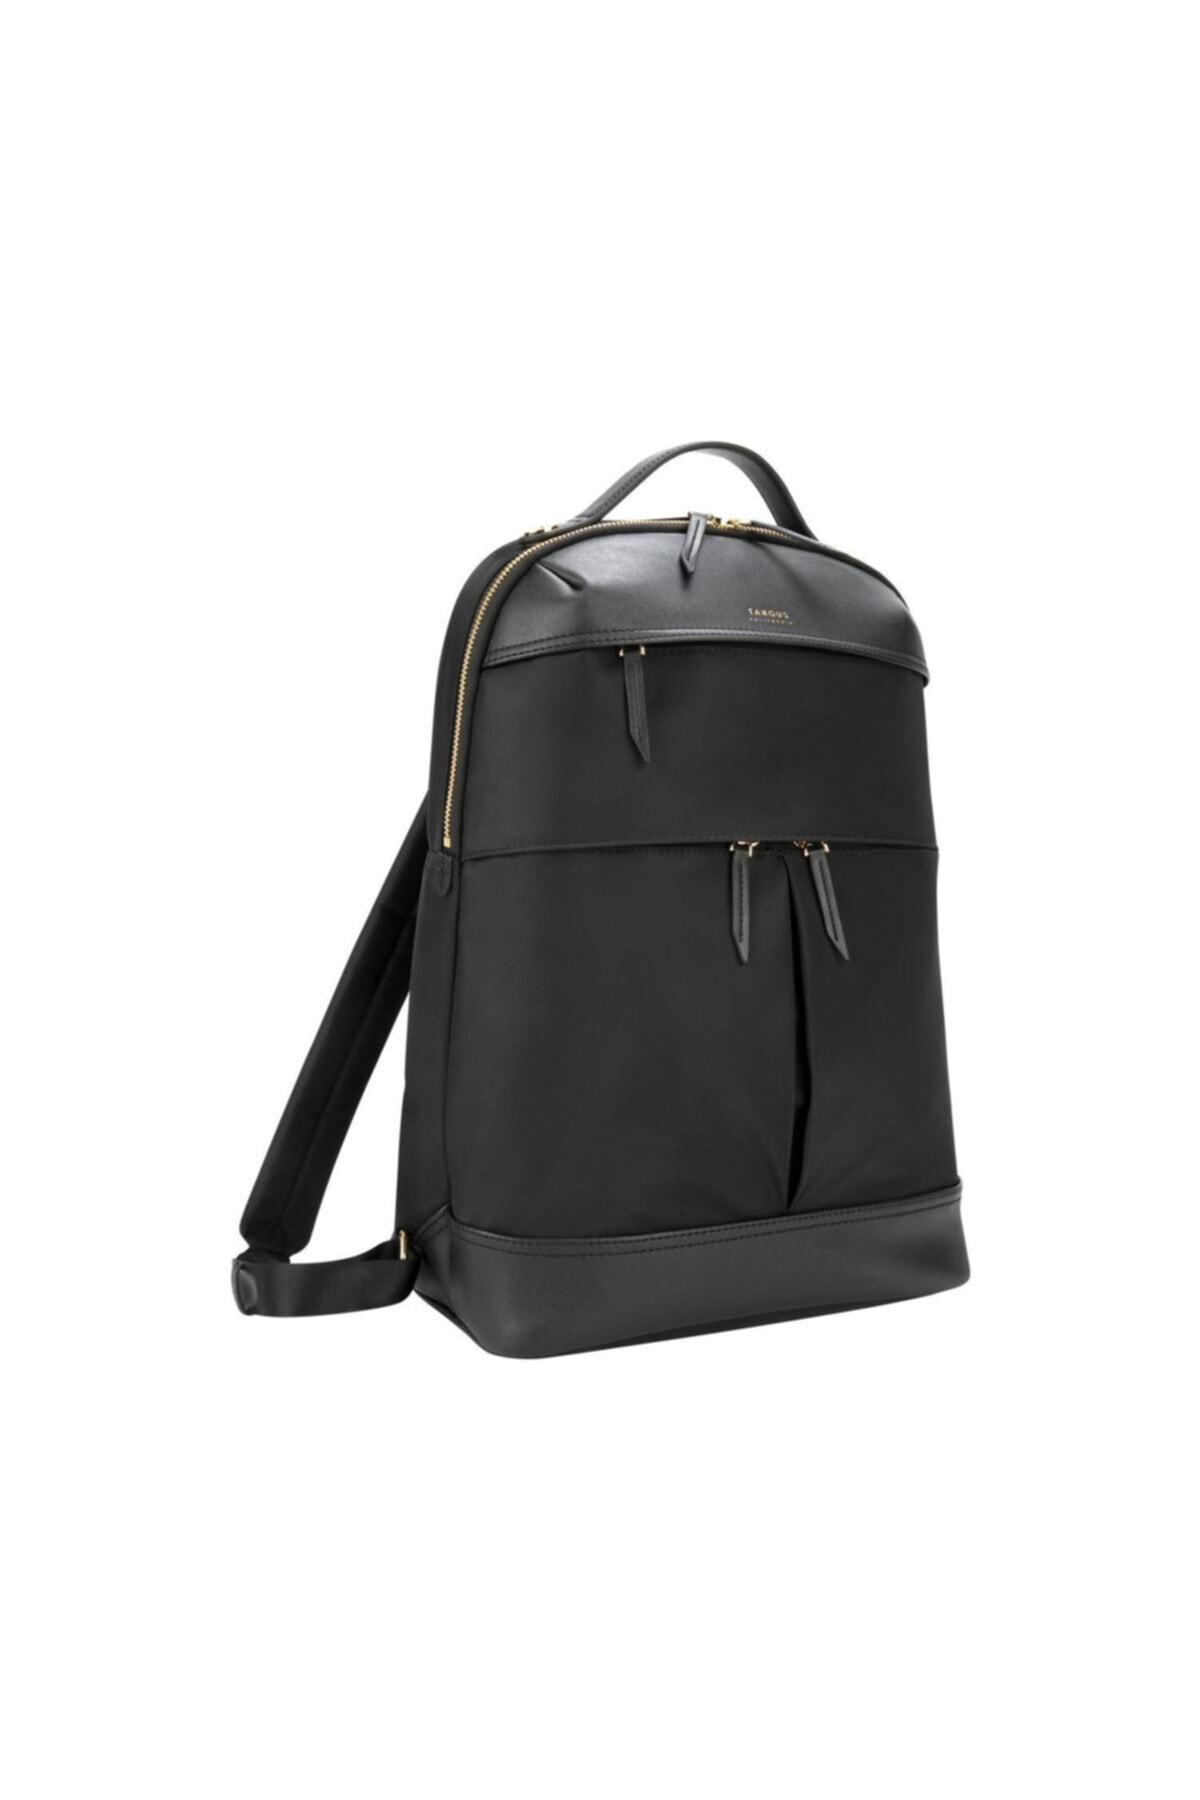 "15"" Newport Backpack Siyah Laptop Çantası"